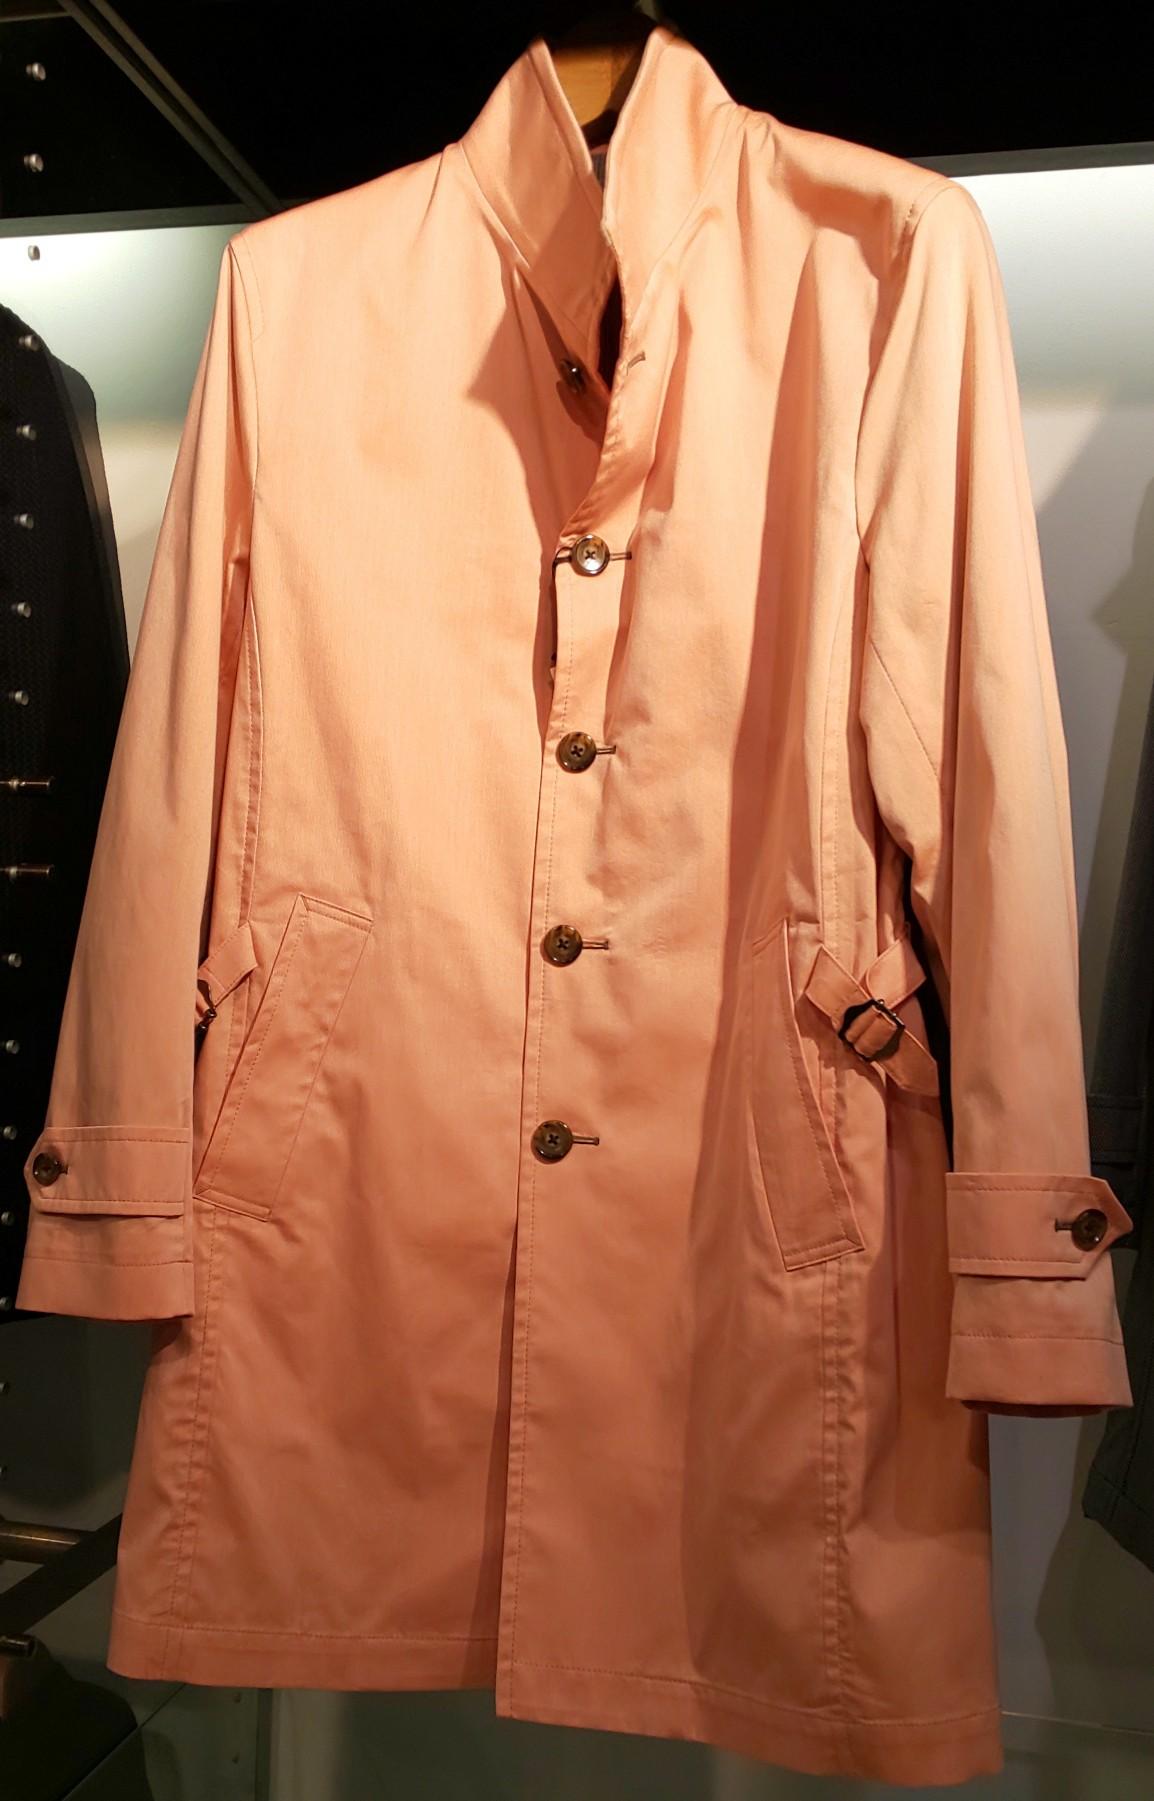 MEN'S BIGI ストレッチ スタンドカラースプリングコート オレンジ 31,900円